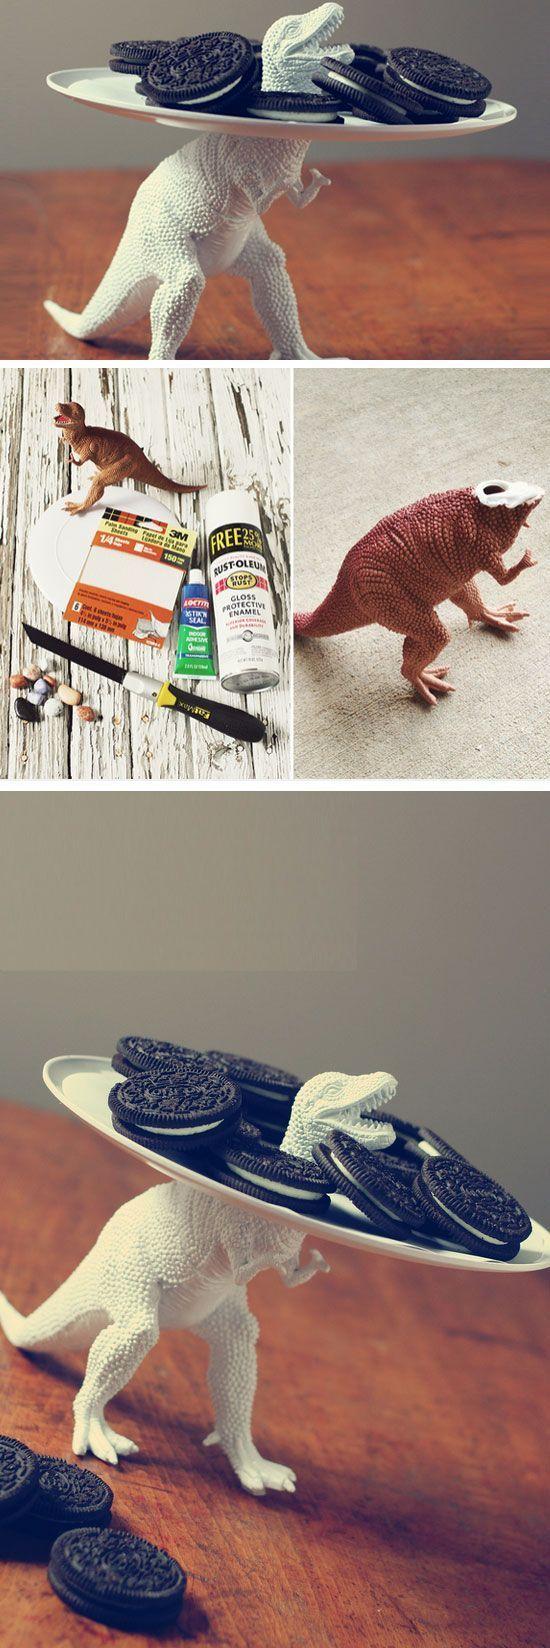 Dinosaurierschüssel #dinosaur